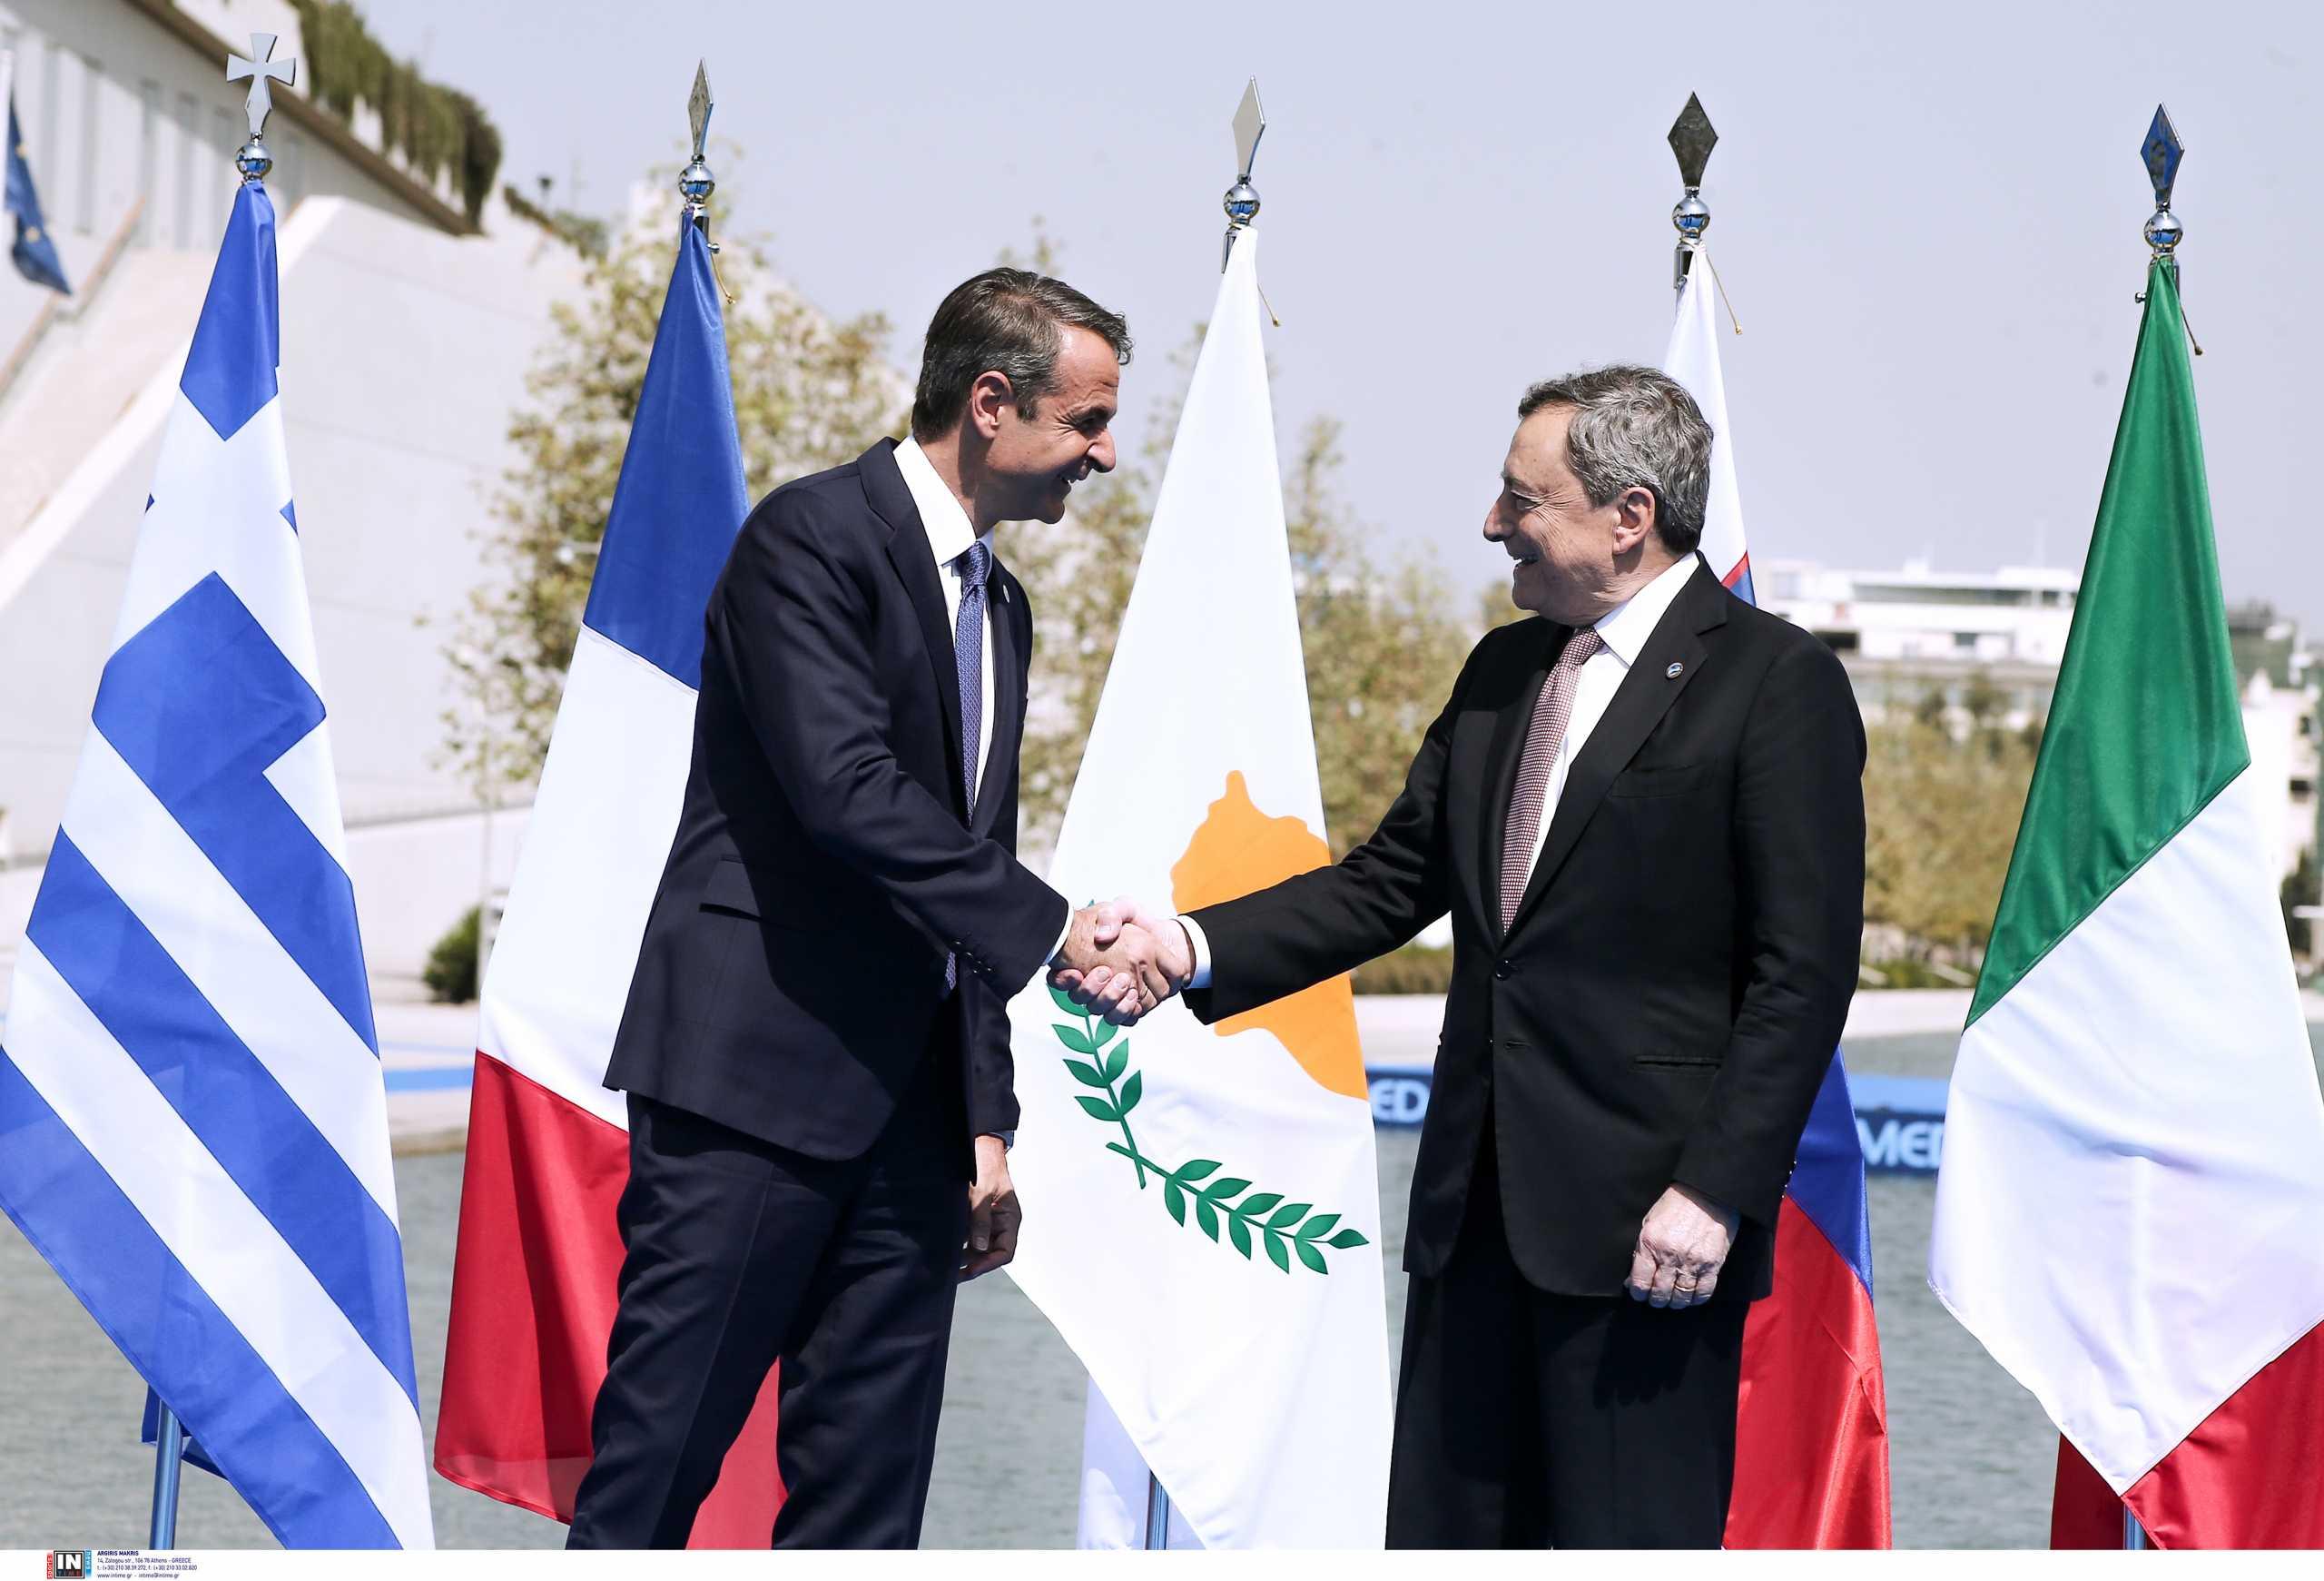 Eumed9 – Σύνοδος Κορυφής στο Σταύρος Νιάρχος – Ο Κυριάκος Μητσοτάκης συναντήθηκε με τον Μάριο Ντράγκι